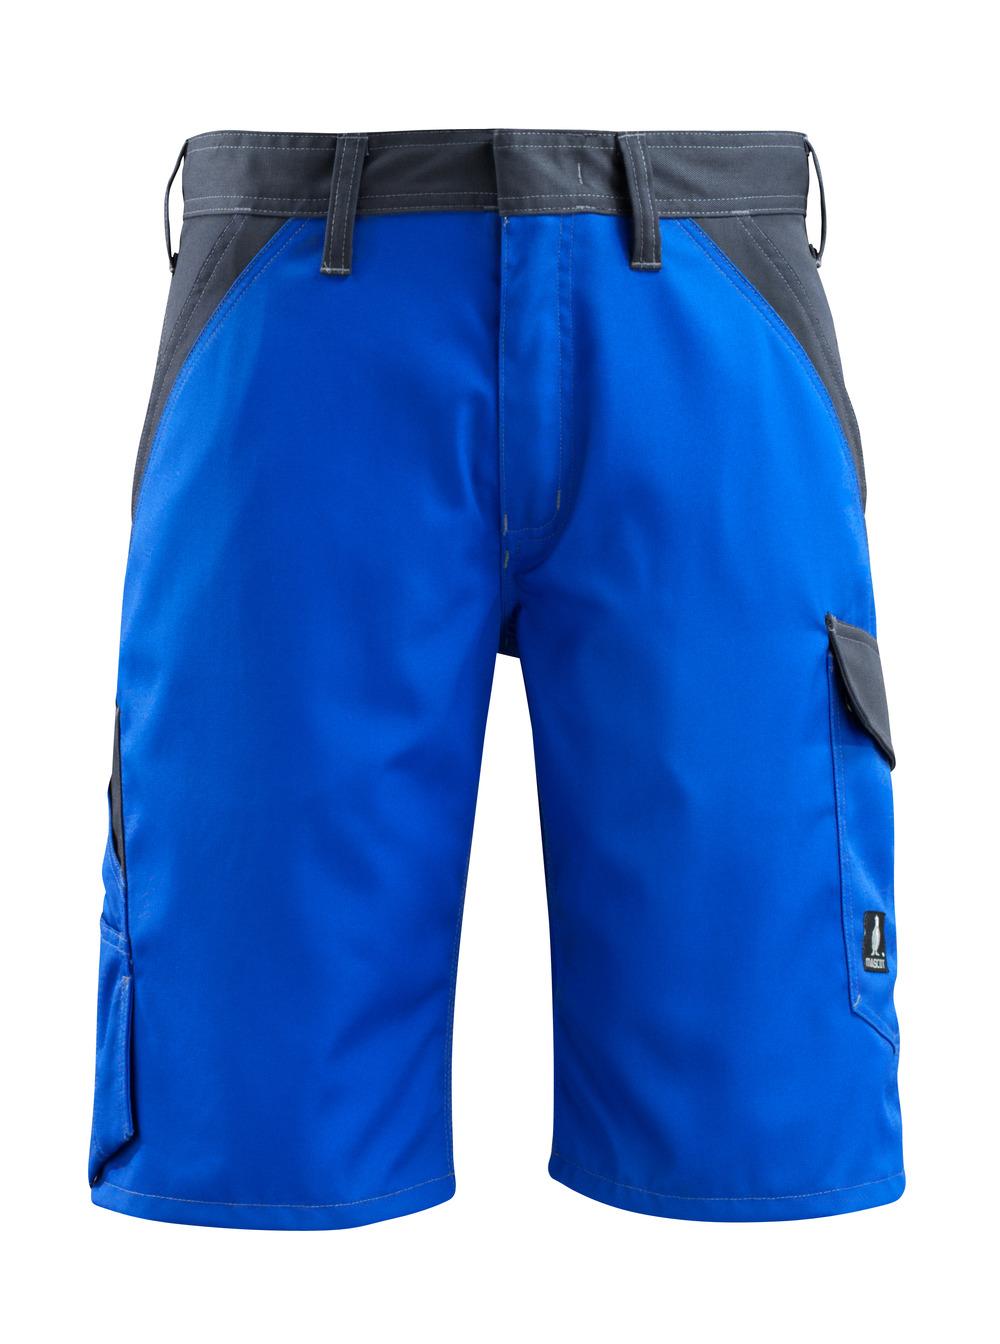 15749-330-11010 Shorts - kobolt/mørk marine